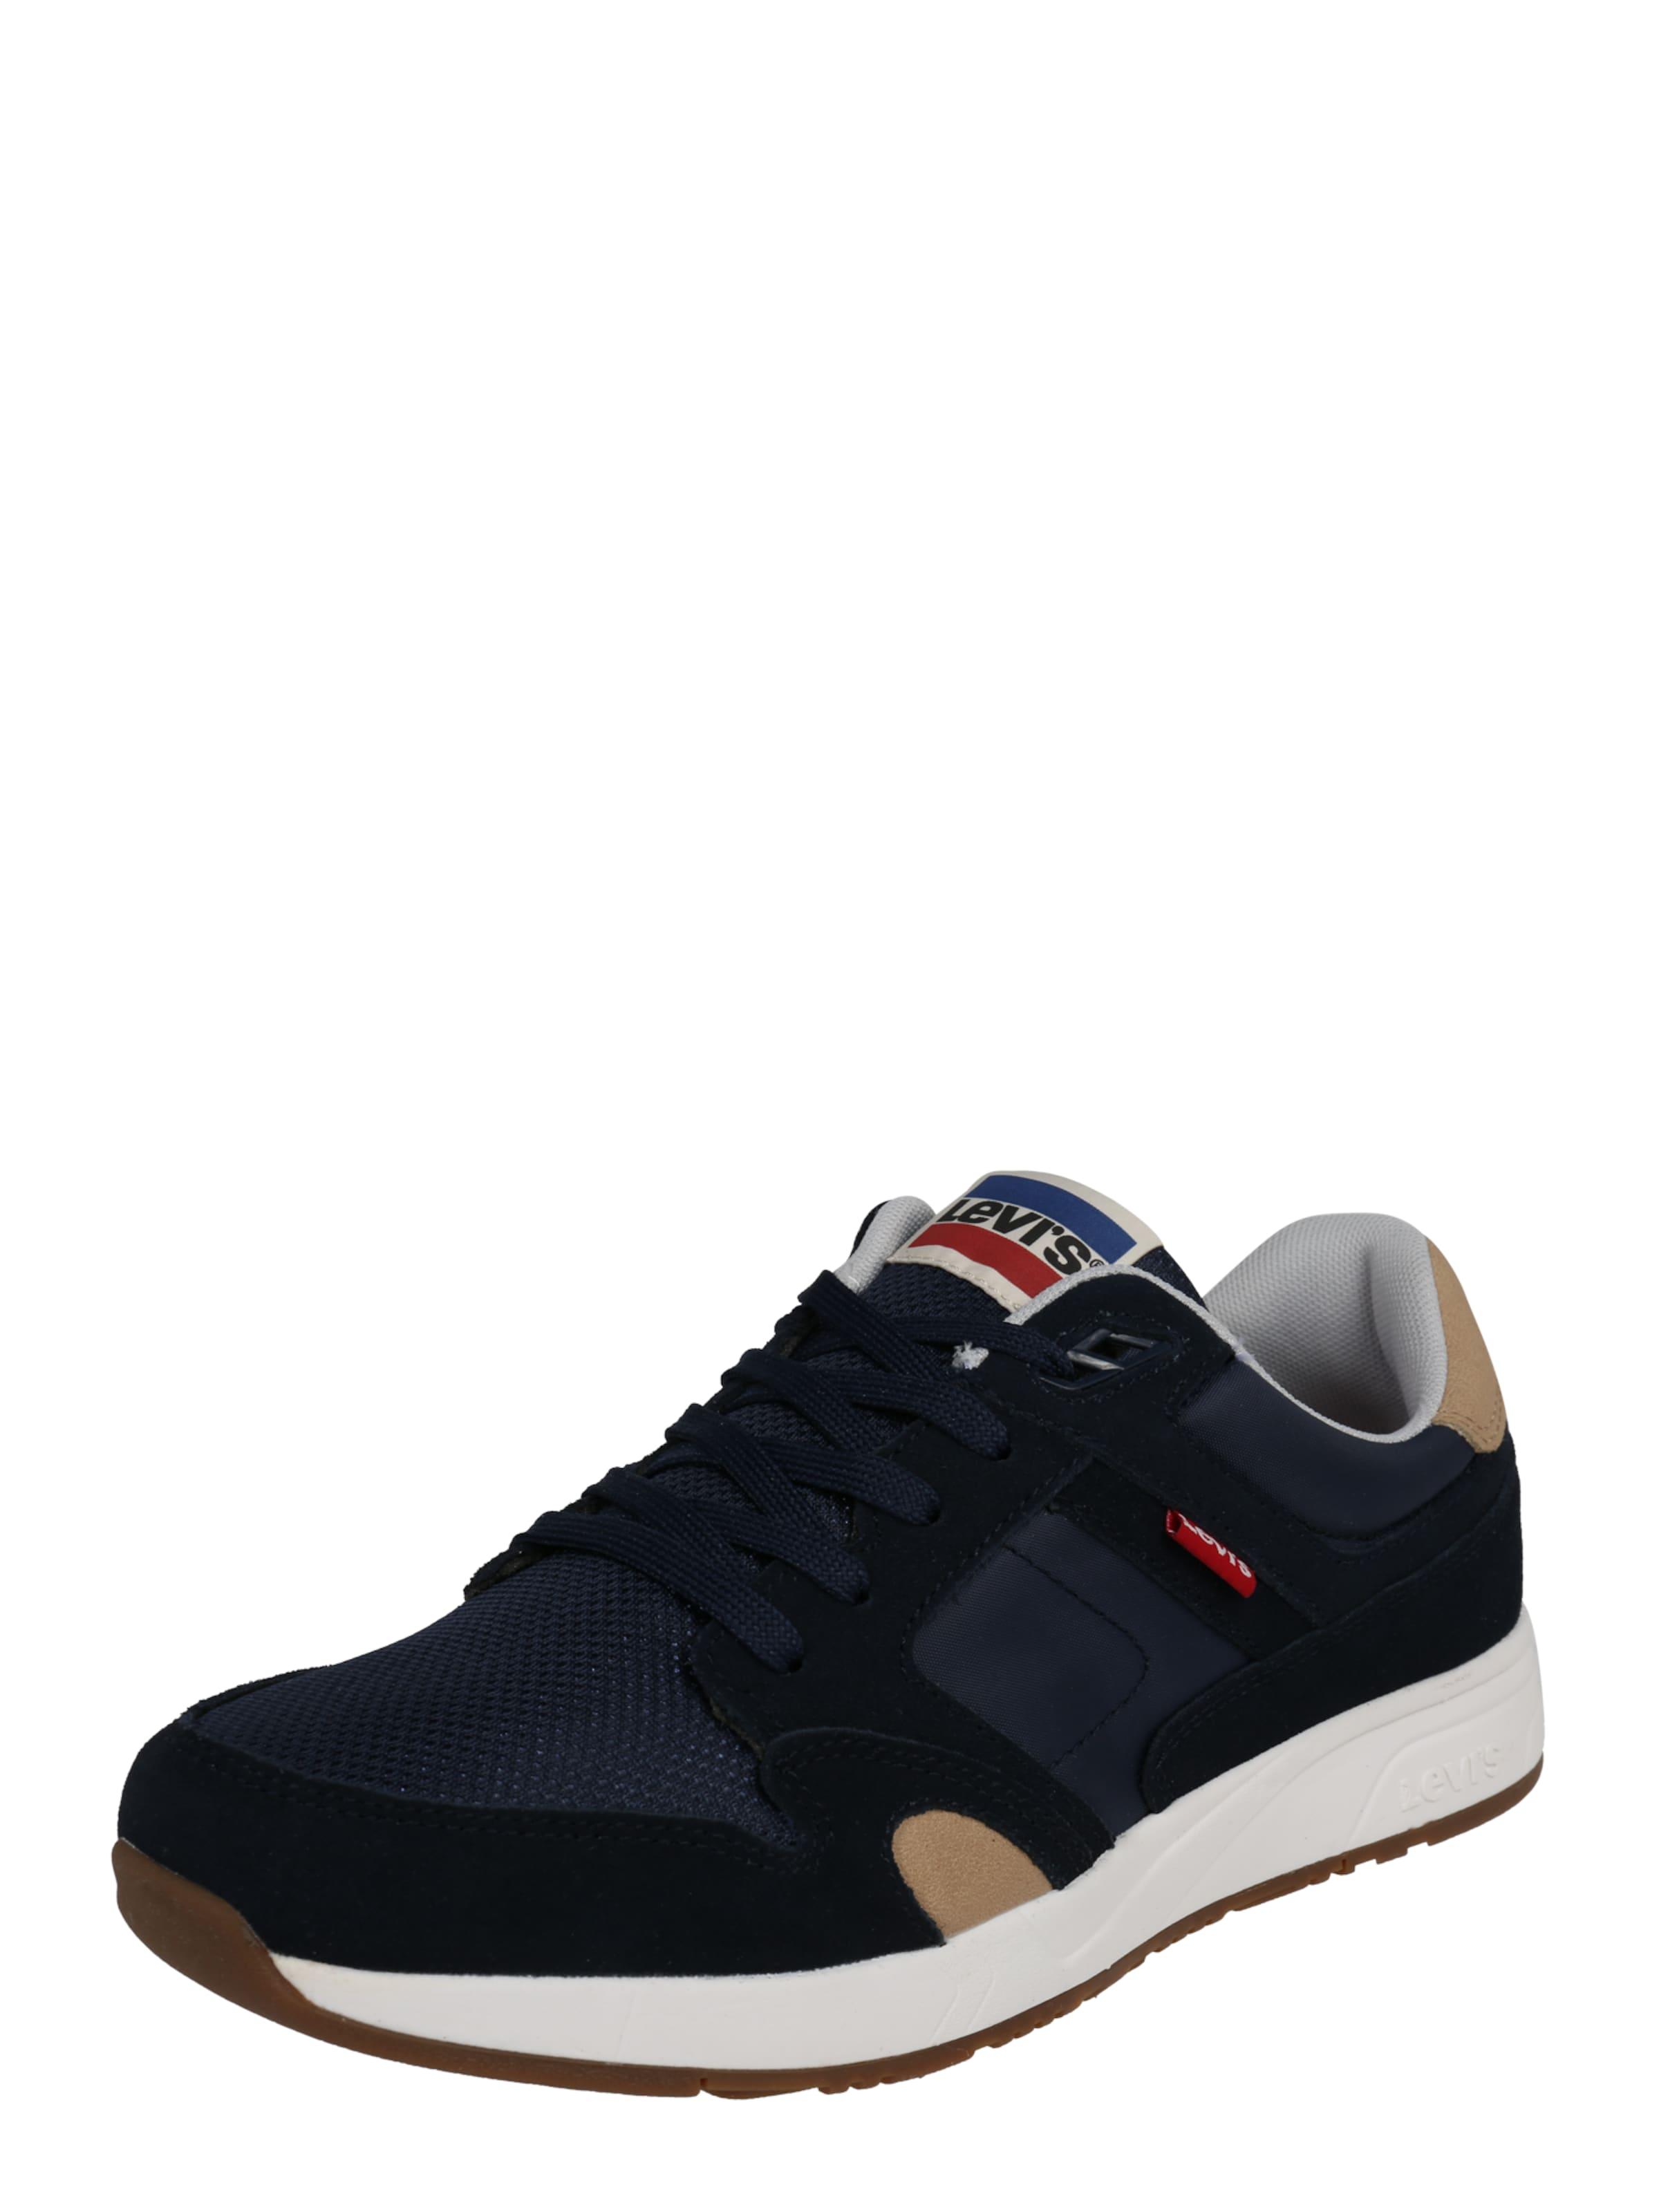 BeigeBlau BeigeBlau Sneaker In Levi's Levi's 'sutter' 'sutter' Levi's Sneaker 'sutter' In Sneaker In LjAR435